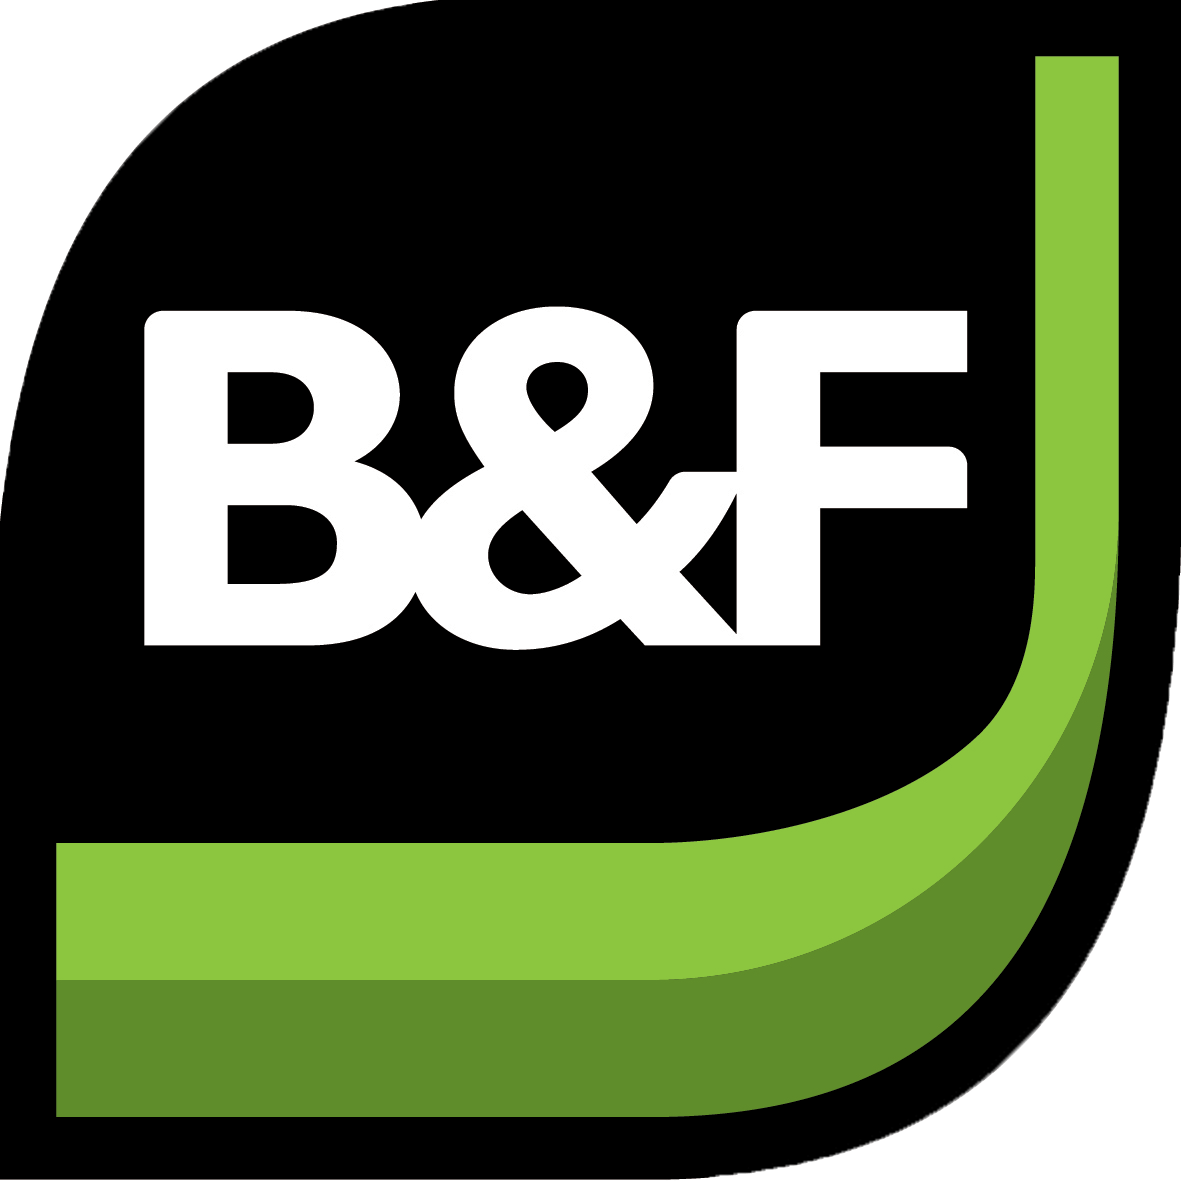 B&F_logo_large vec.png